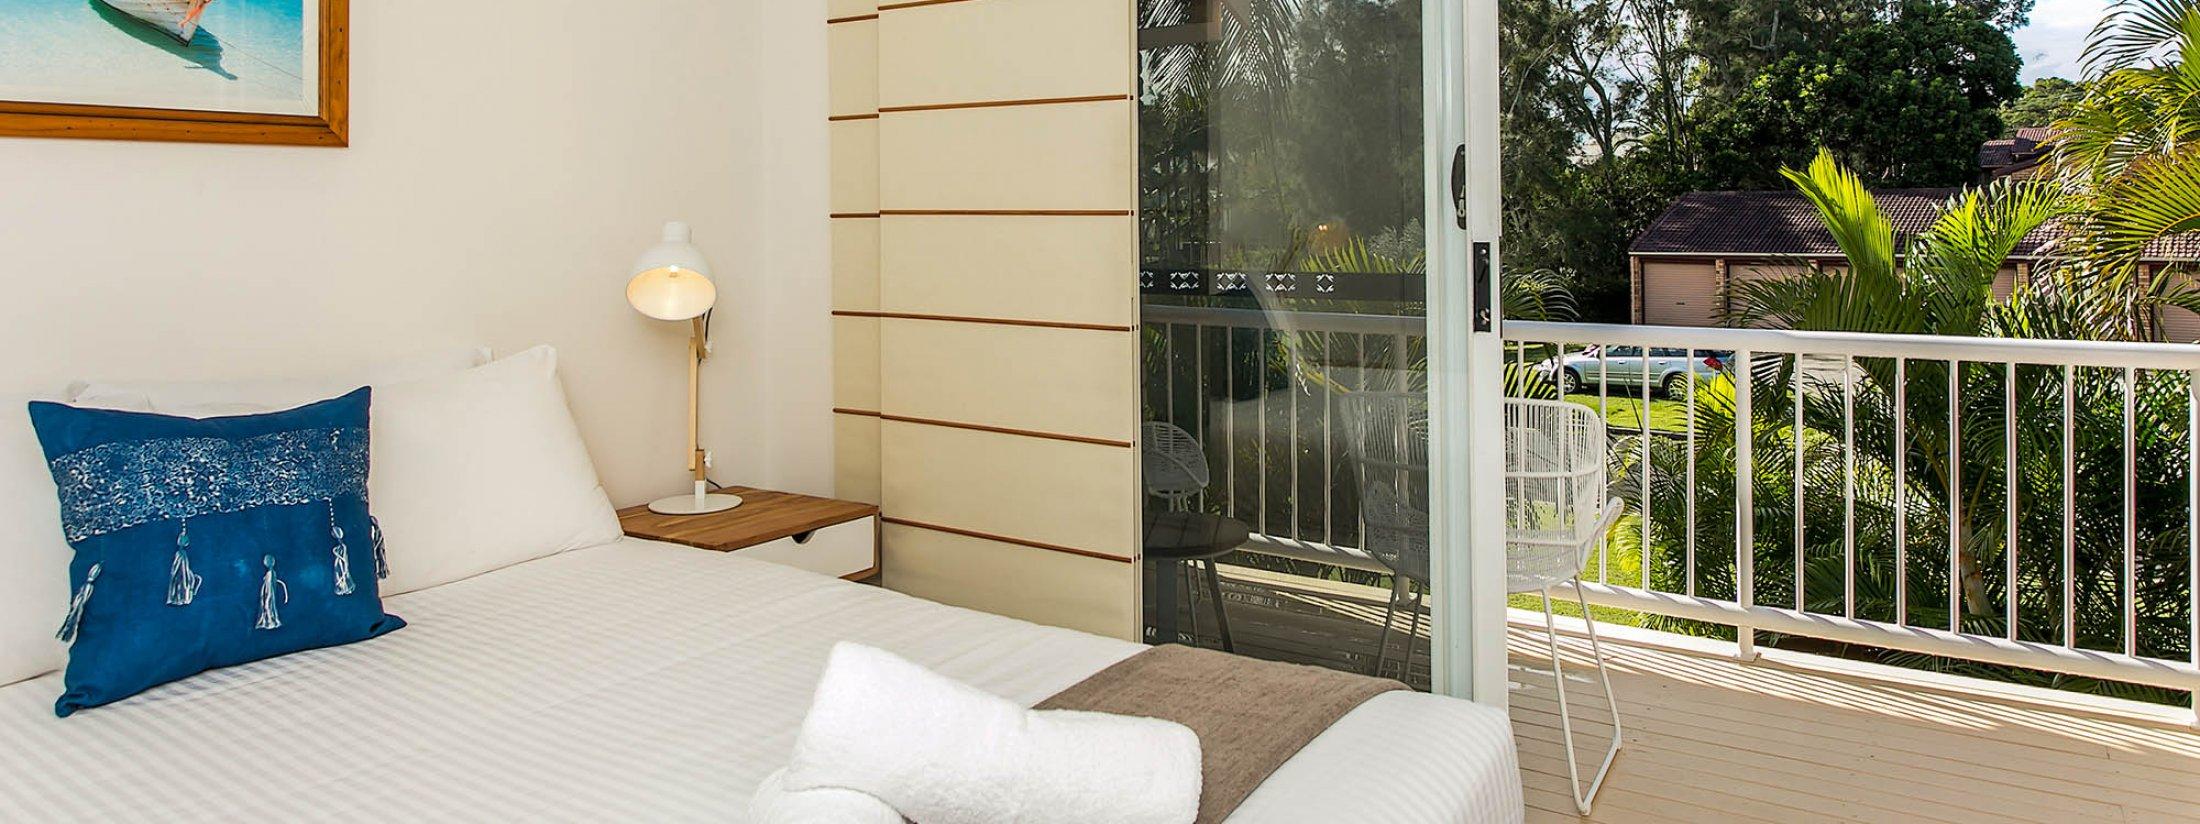 Tradewinds 4 - Clarkes Beach - Bedroom 2b